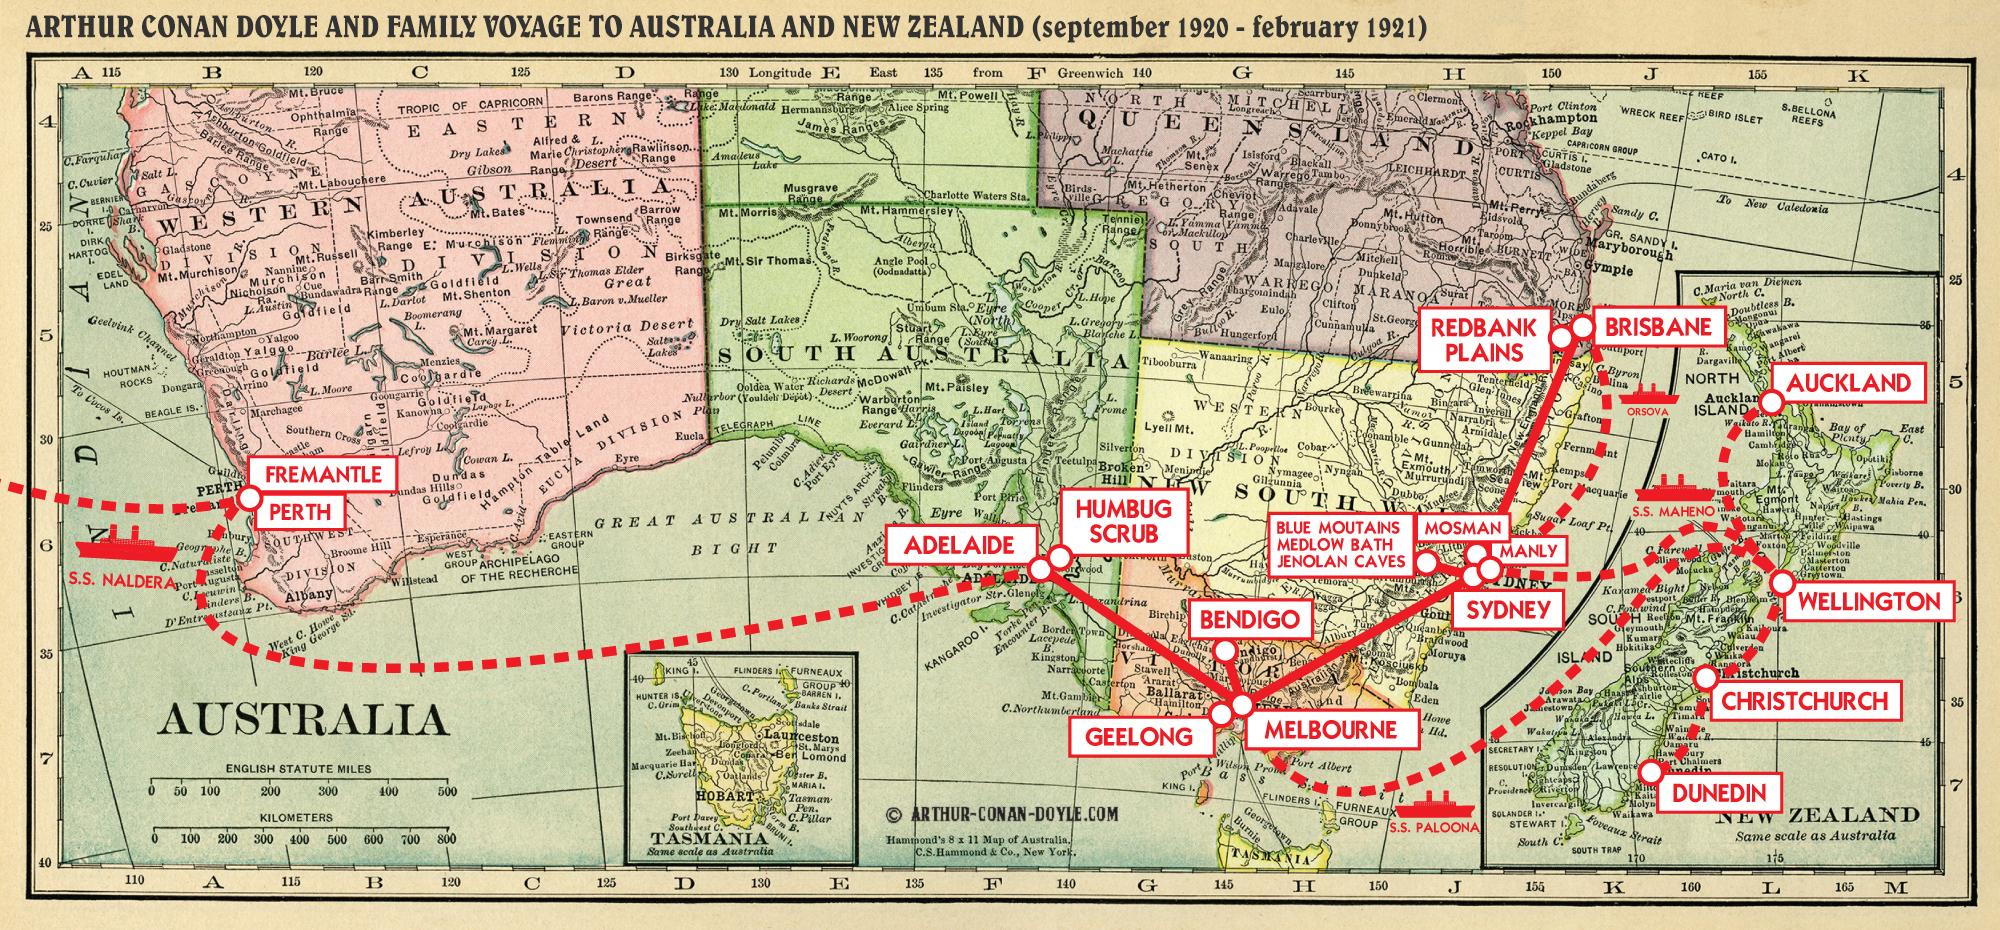 australia map 1920